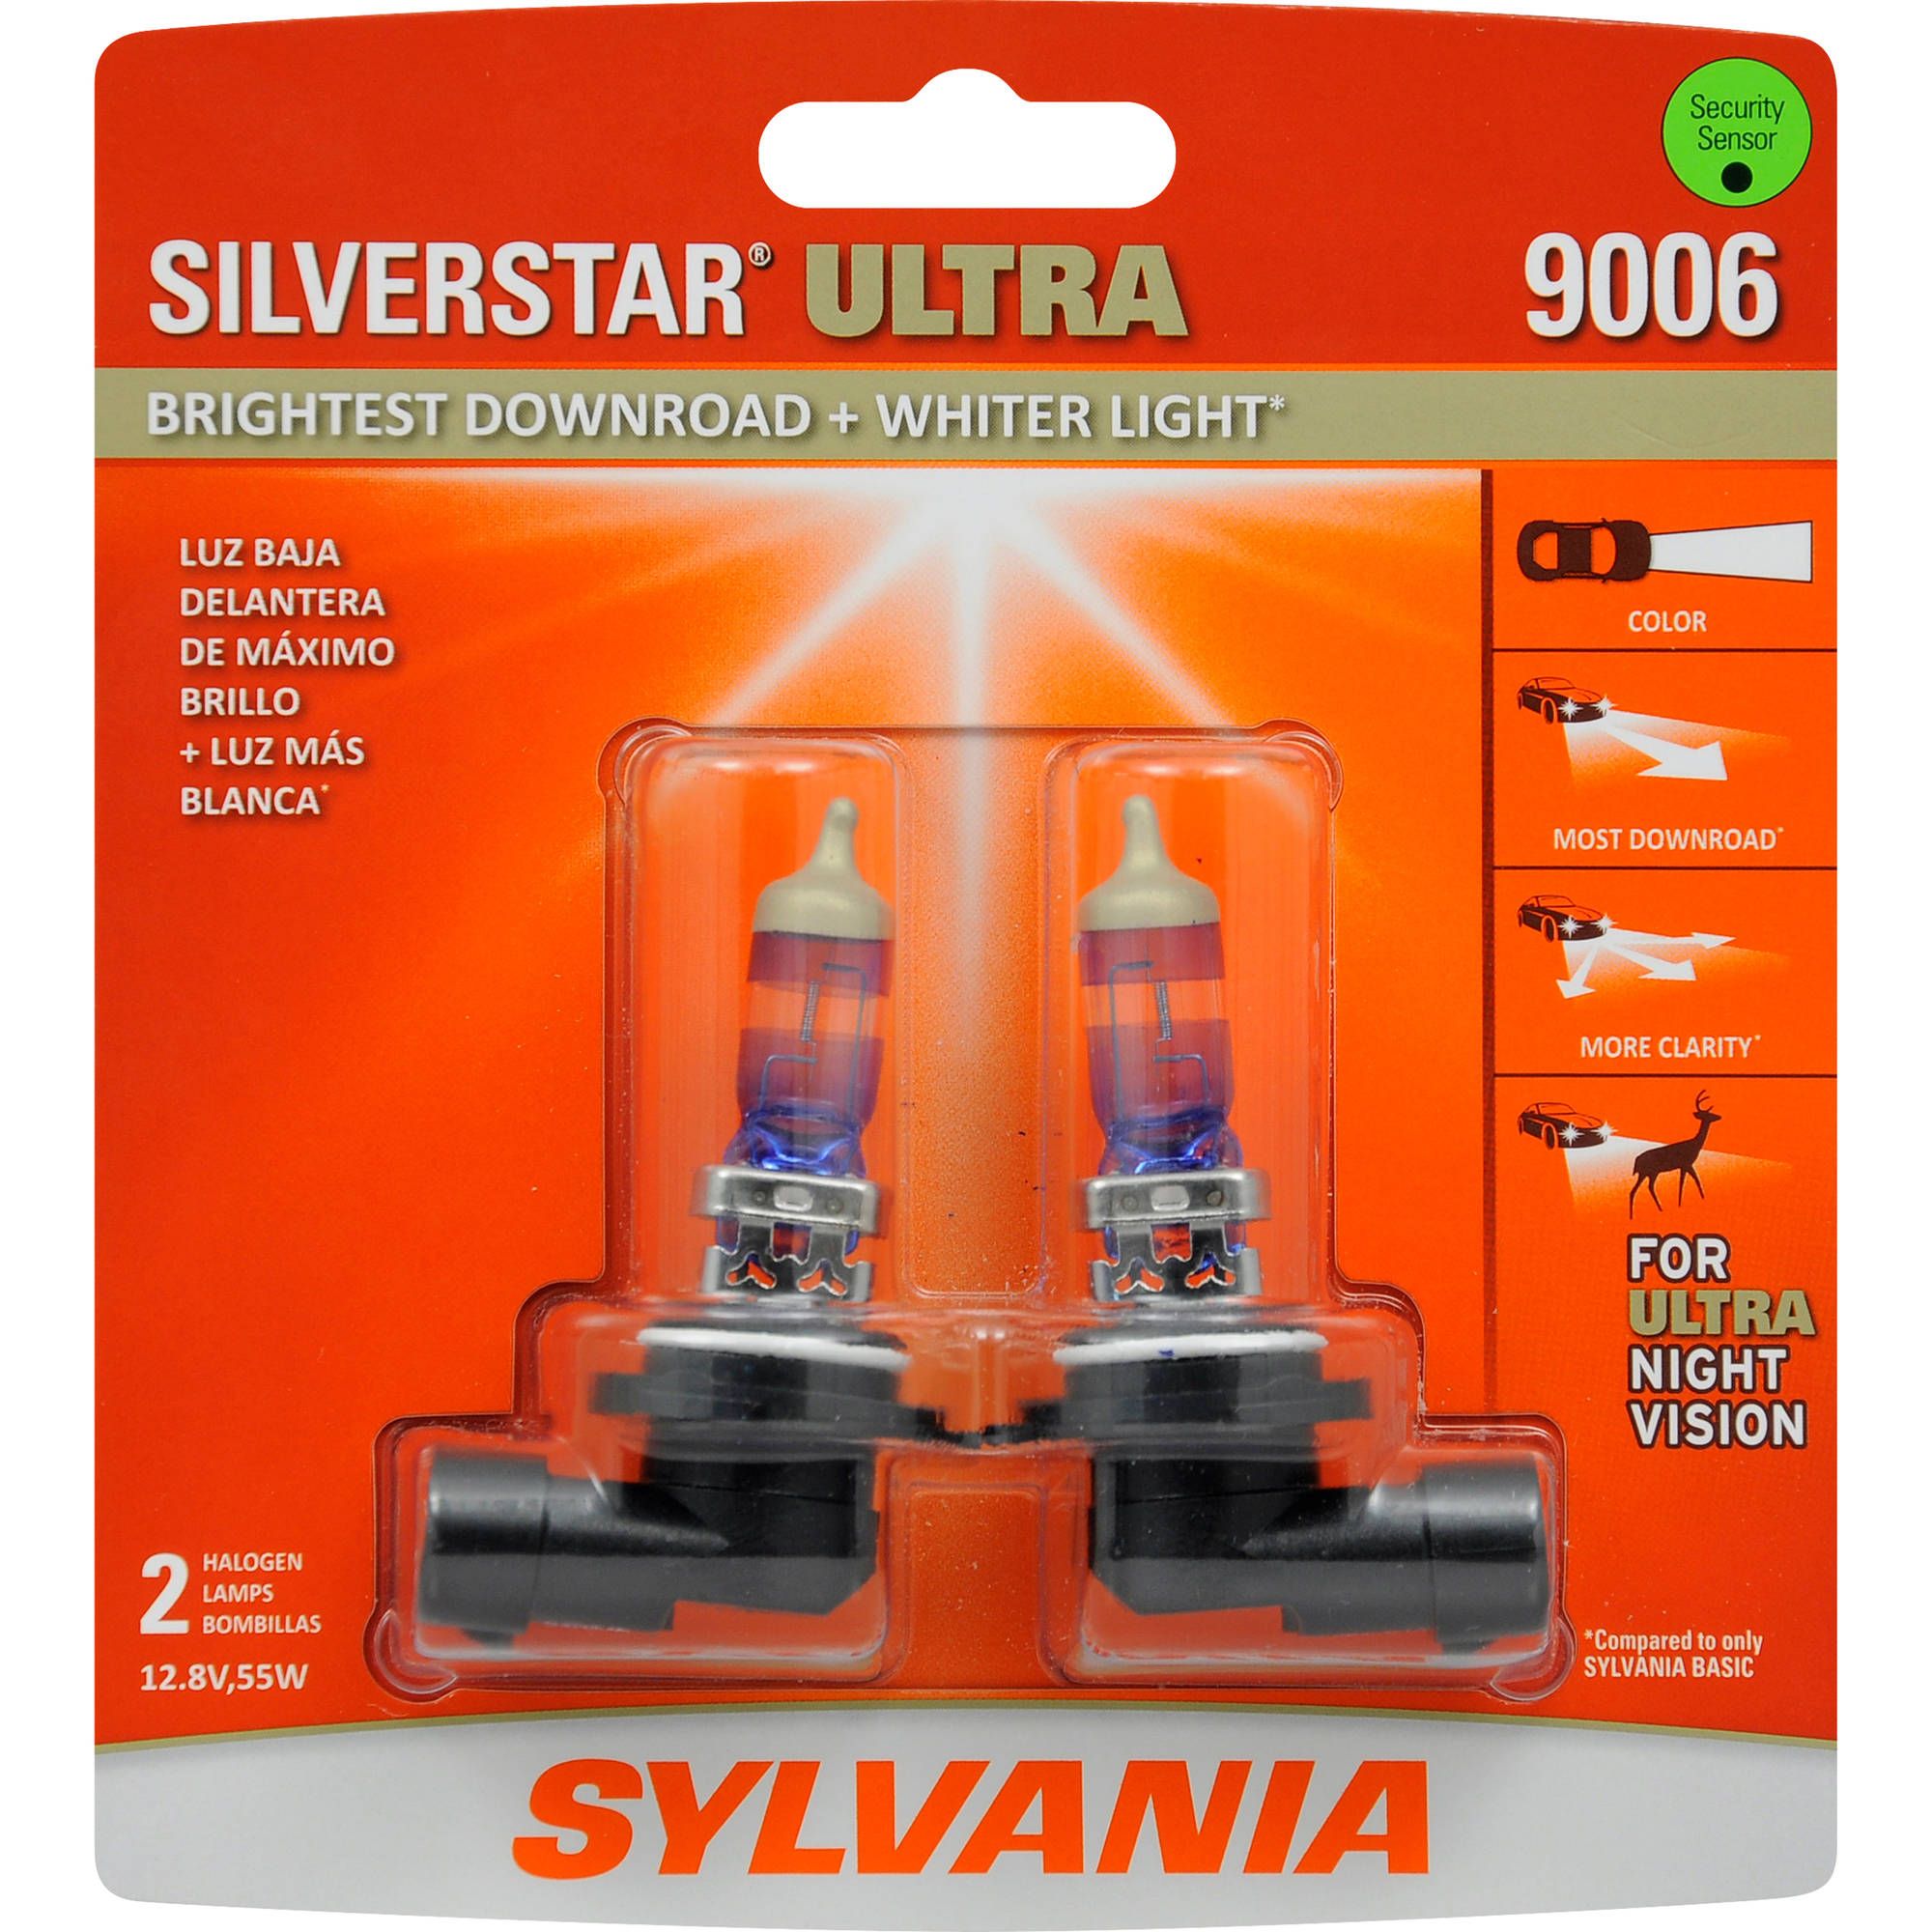 Sylvania 9006 Silverstar Ultra Headlight Contains 2 Bulbs